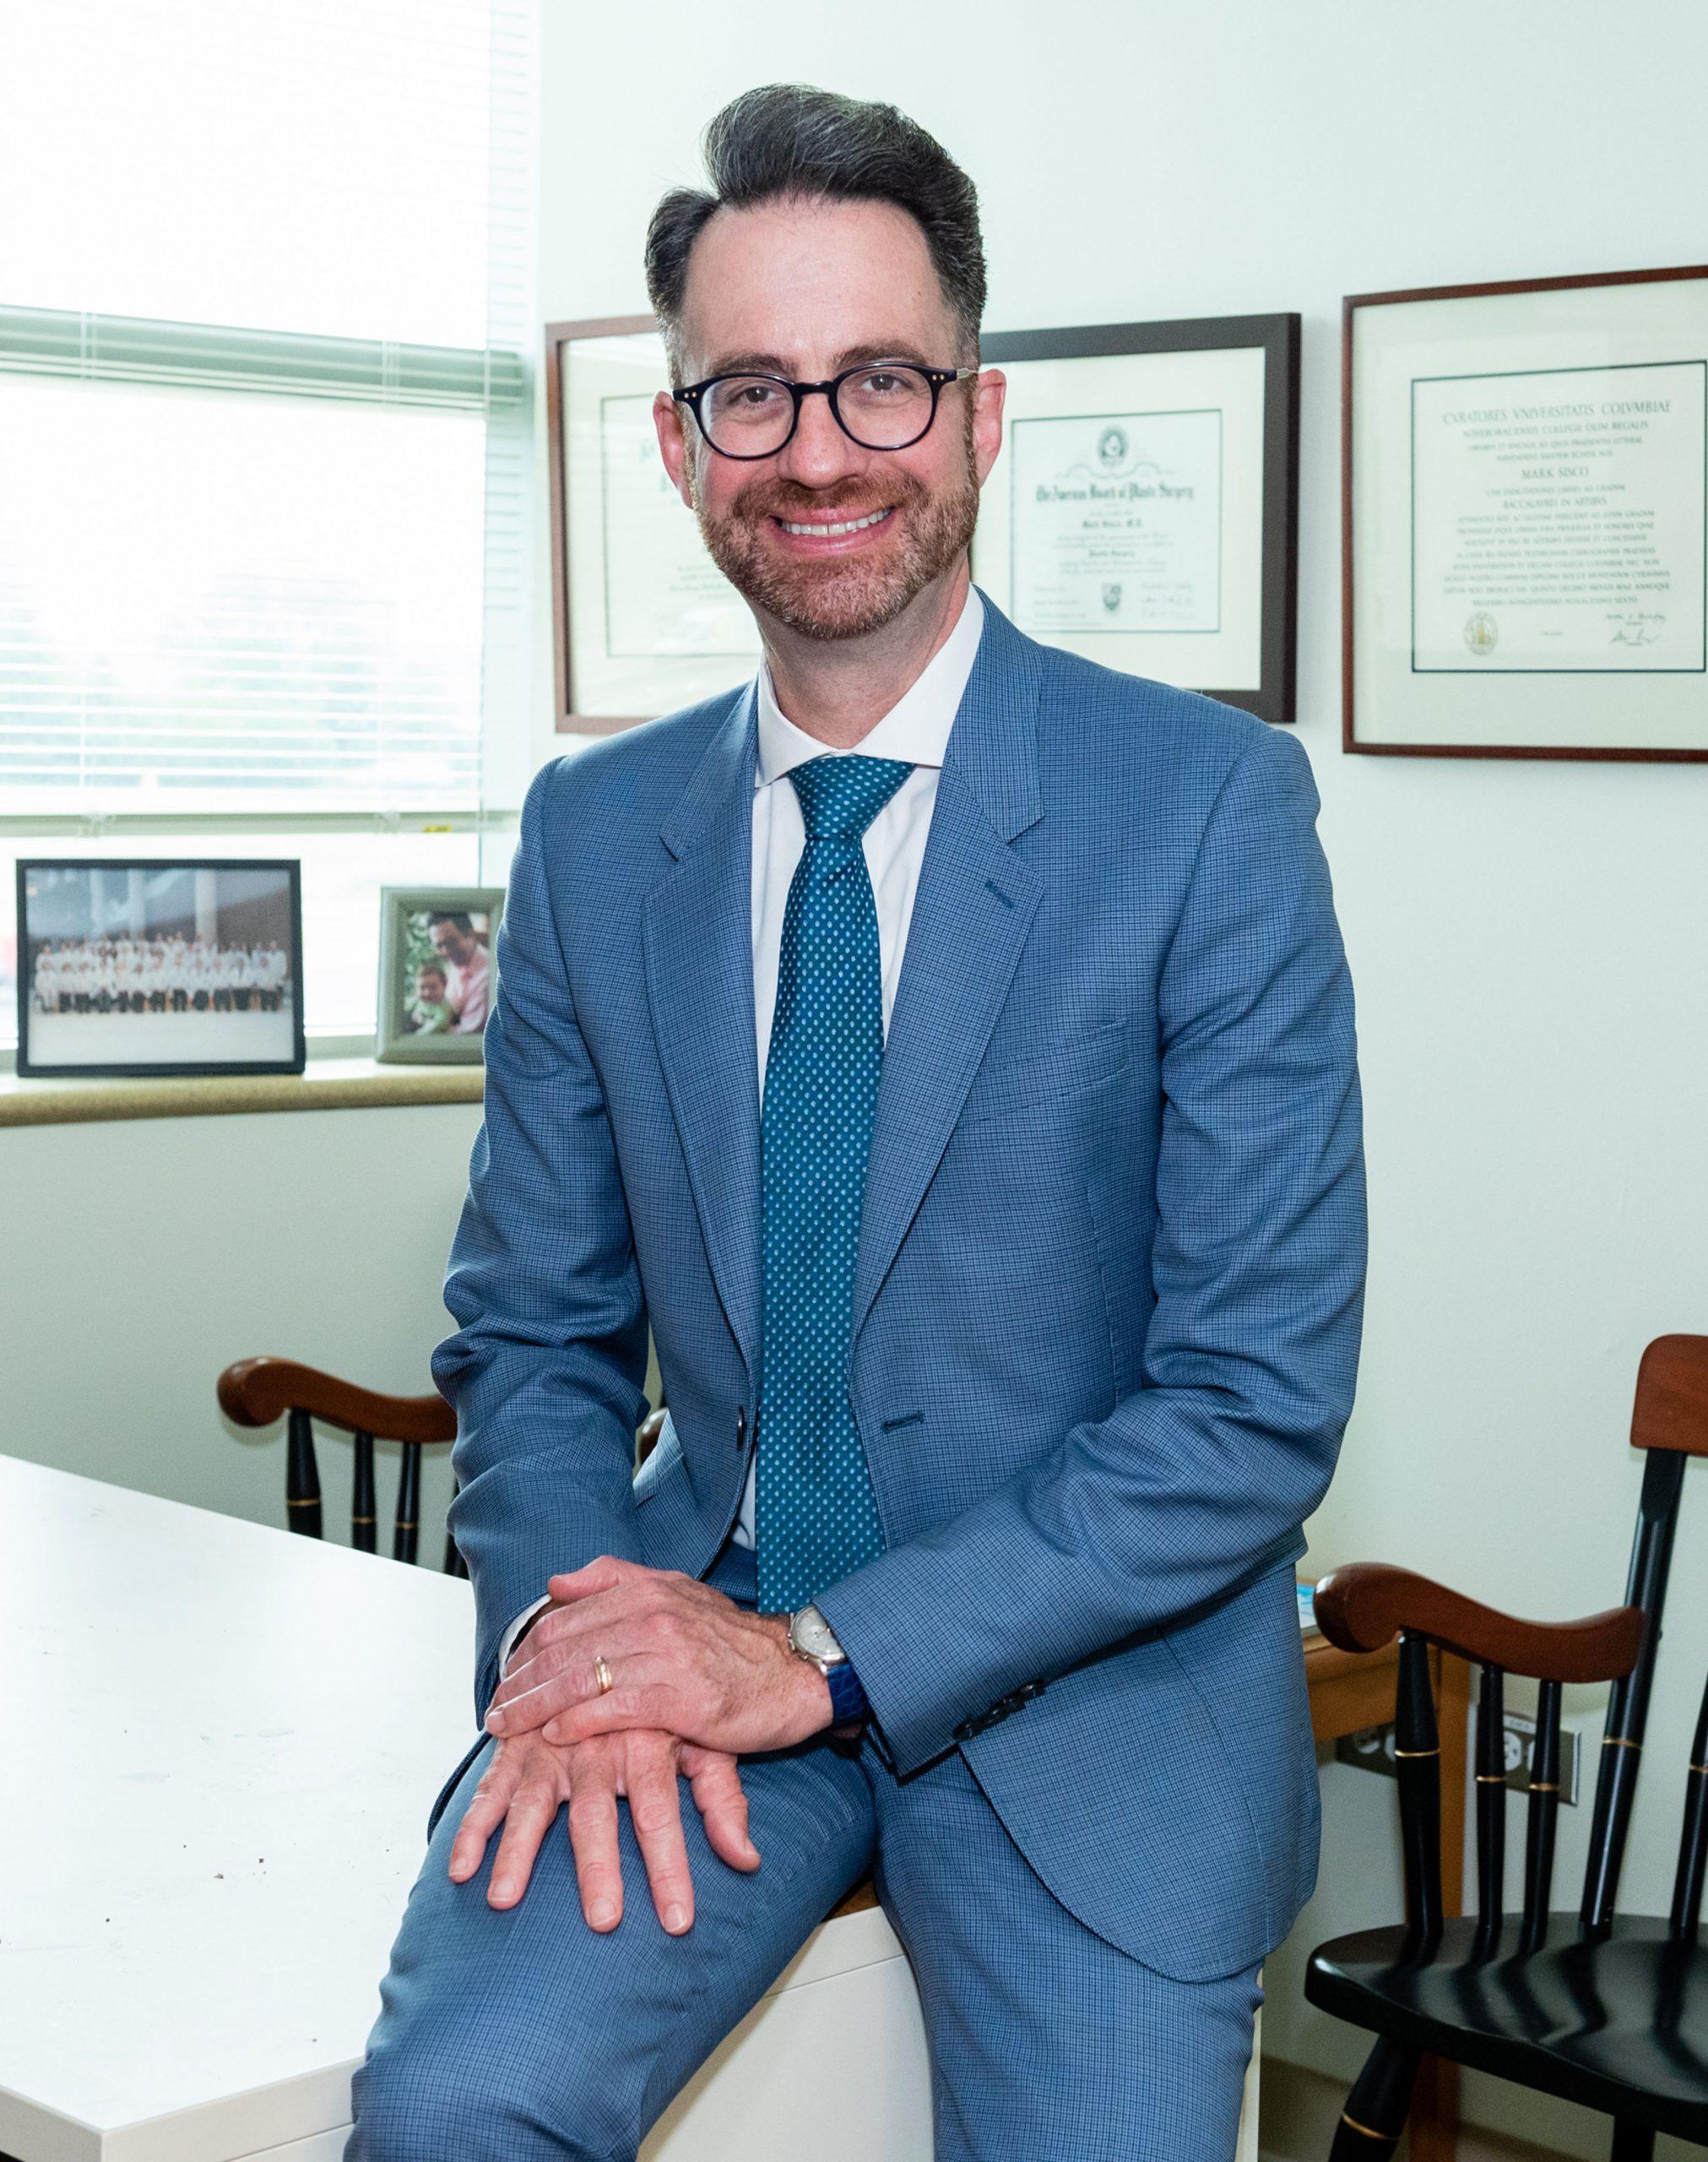 Cosmetic plastic surgeon Dr. Sisco